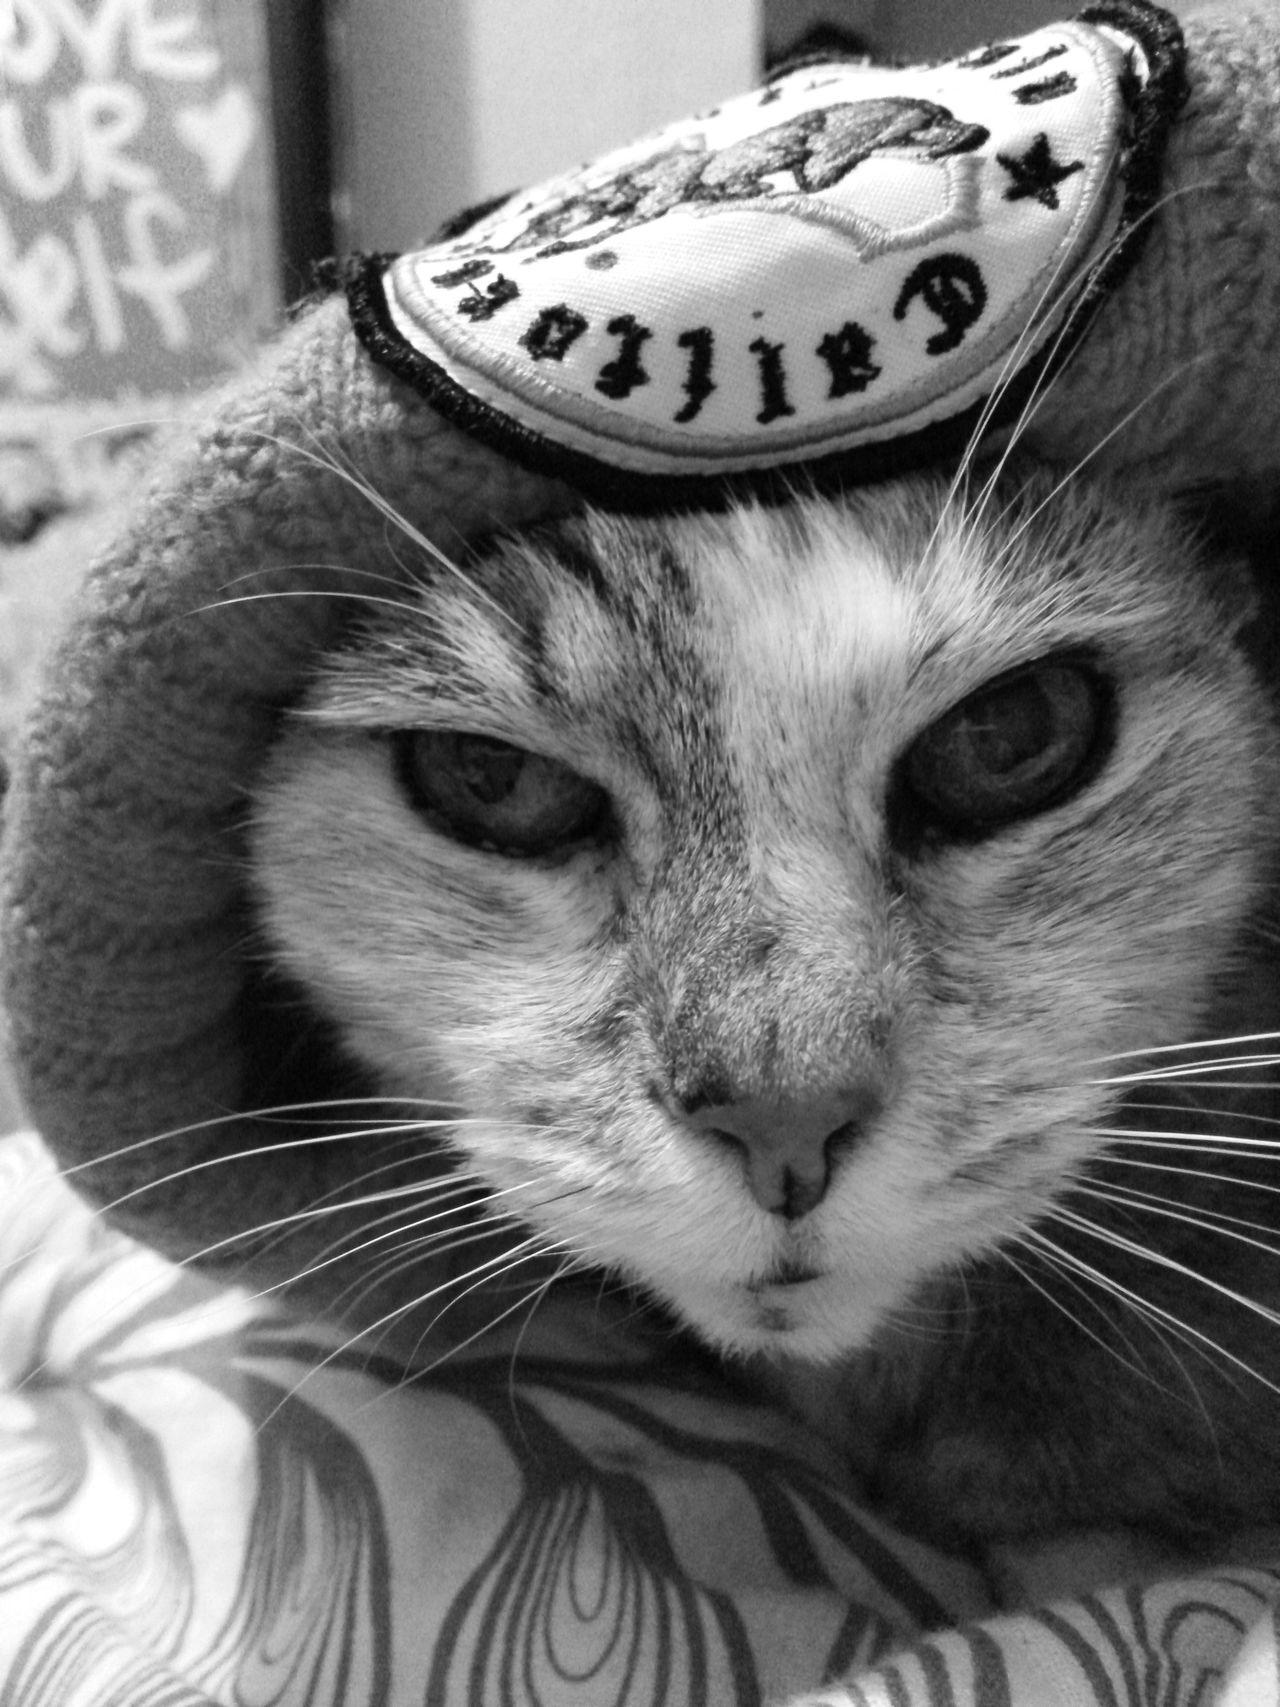 Kitty Gat Kittygato Cat♡ Kitty Cat Petco Petsmart Animal_collection Taking Photos Enjoying Life California Vatogato Freelance Life